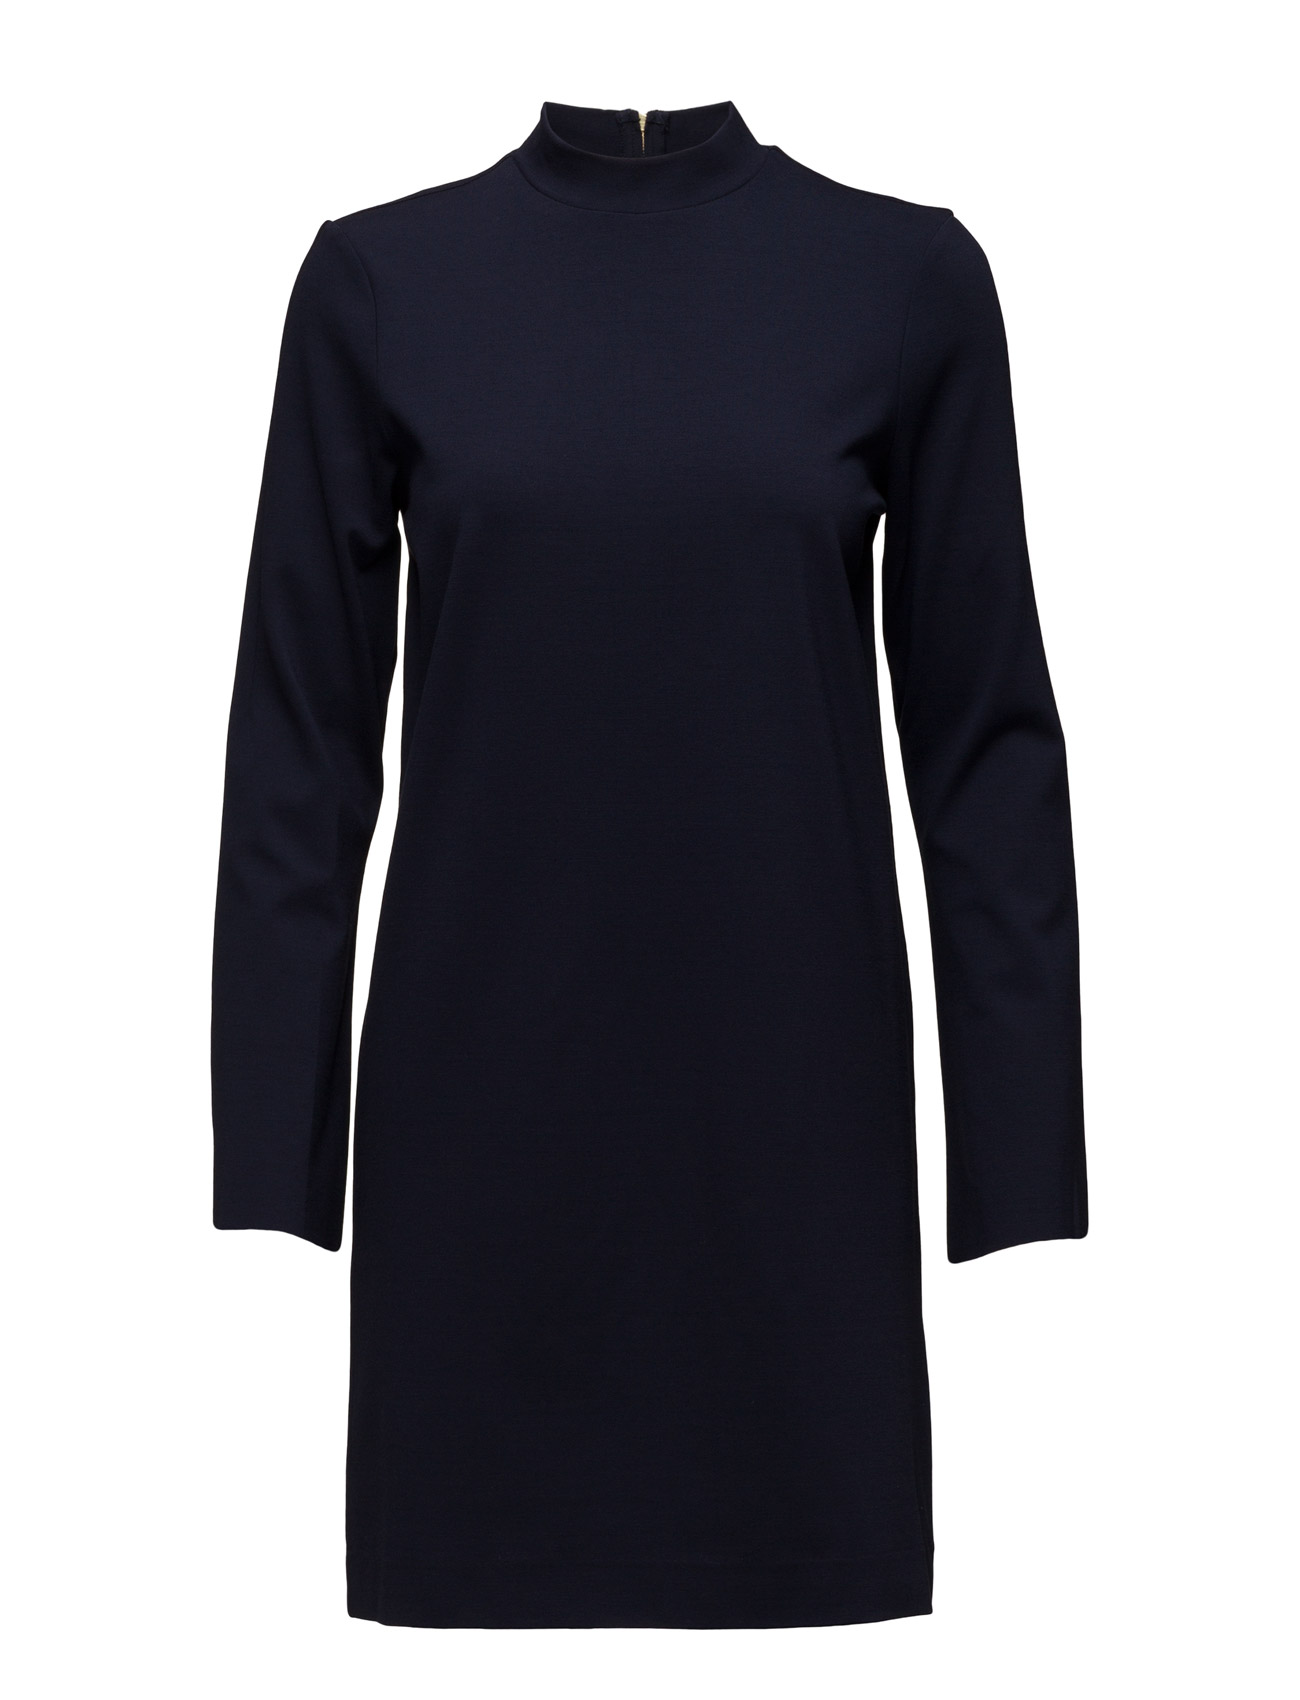 Sandie Turtleneck Dress Designers Remix Korte kjoler til Damer i Navy blå